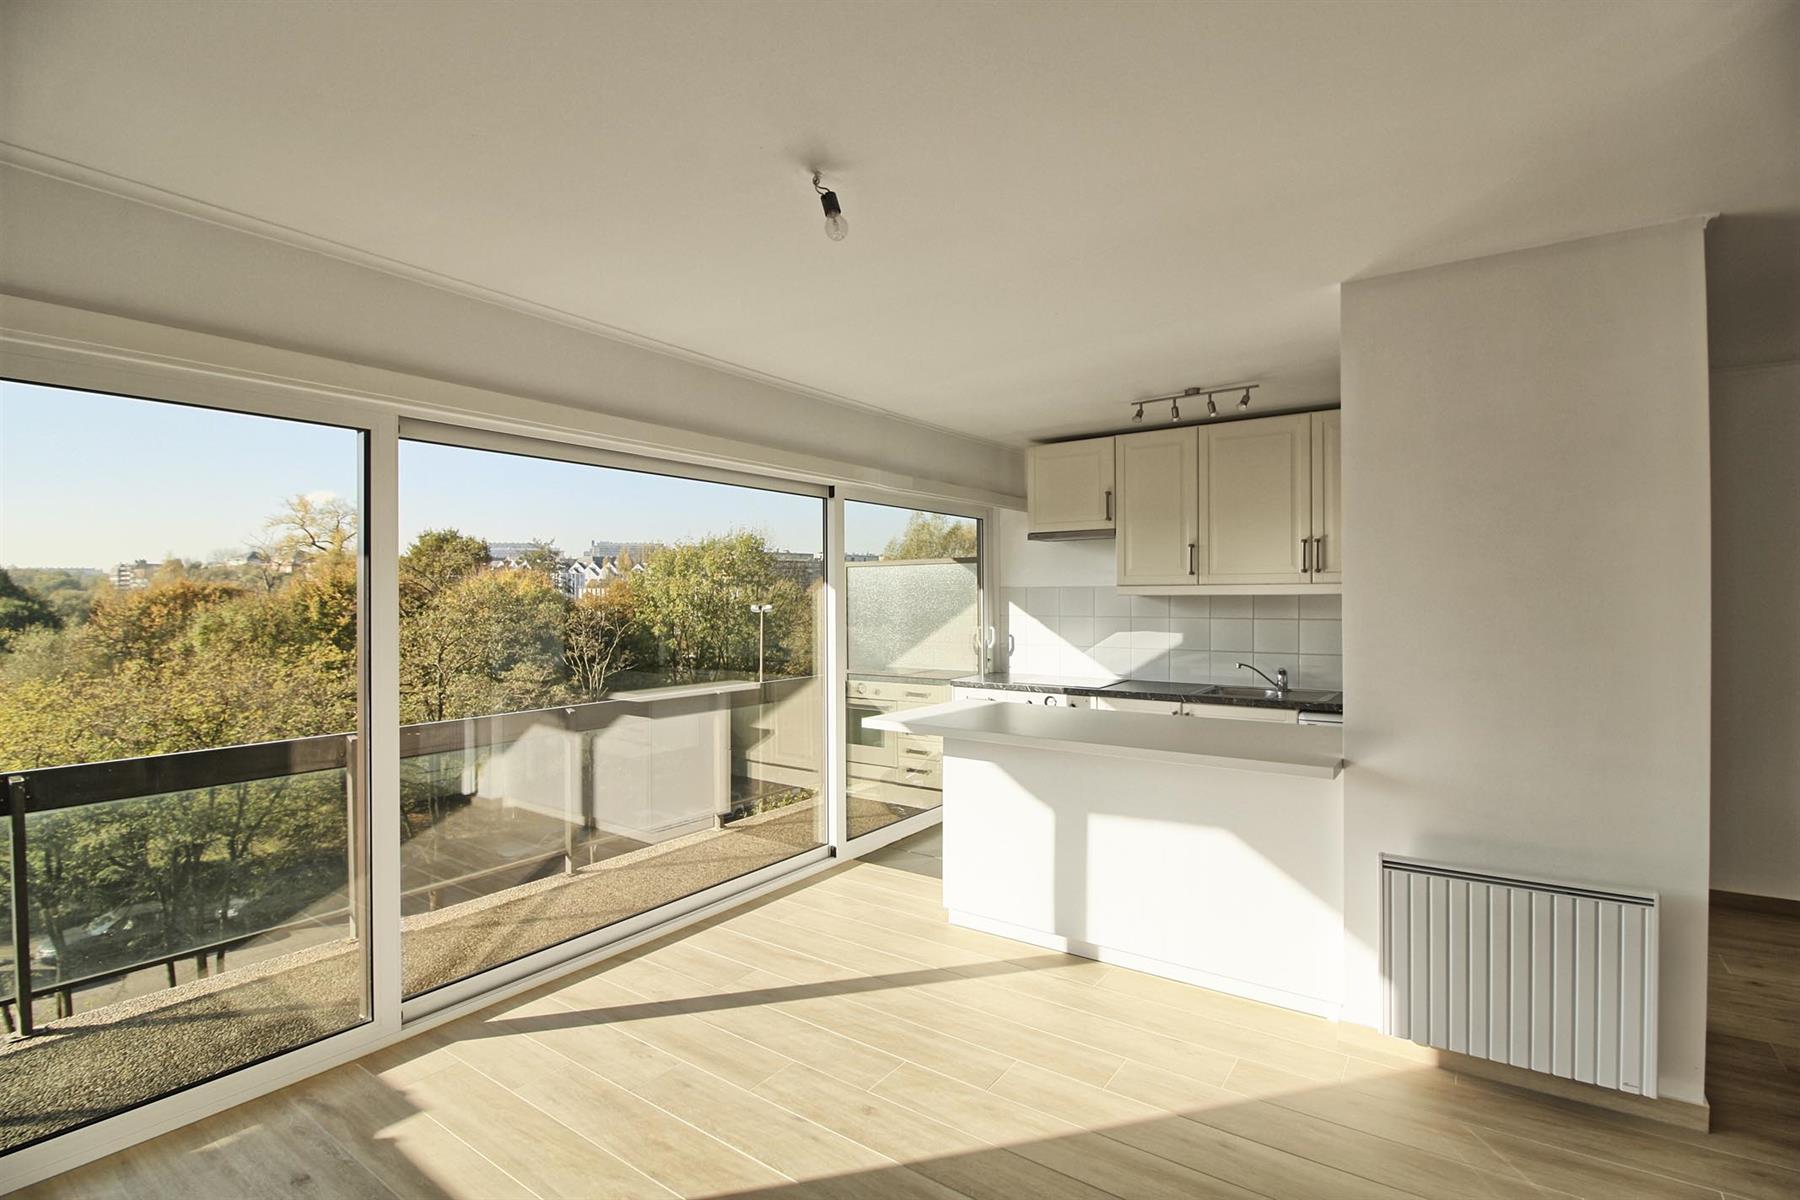 Appartement - Woluwe-Saint-Lambert - #4237926-4